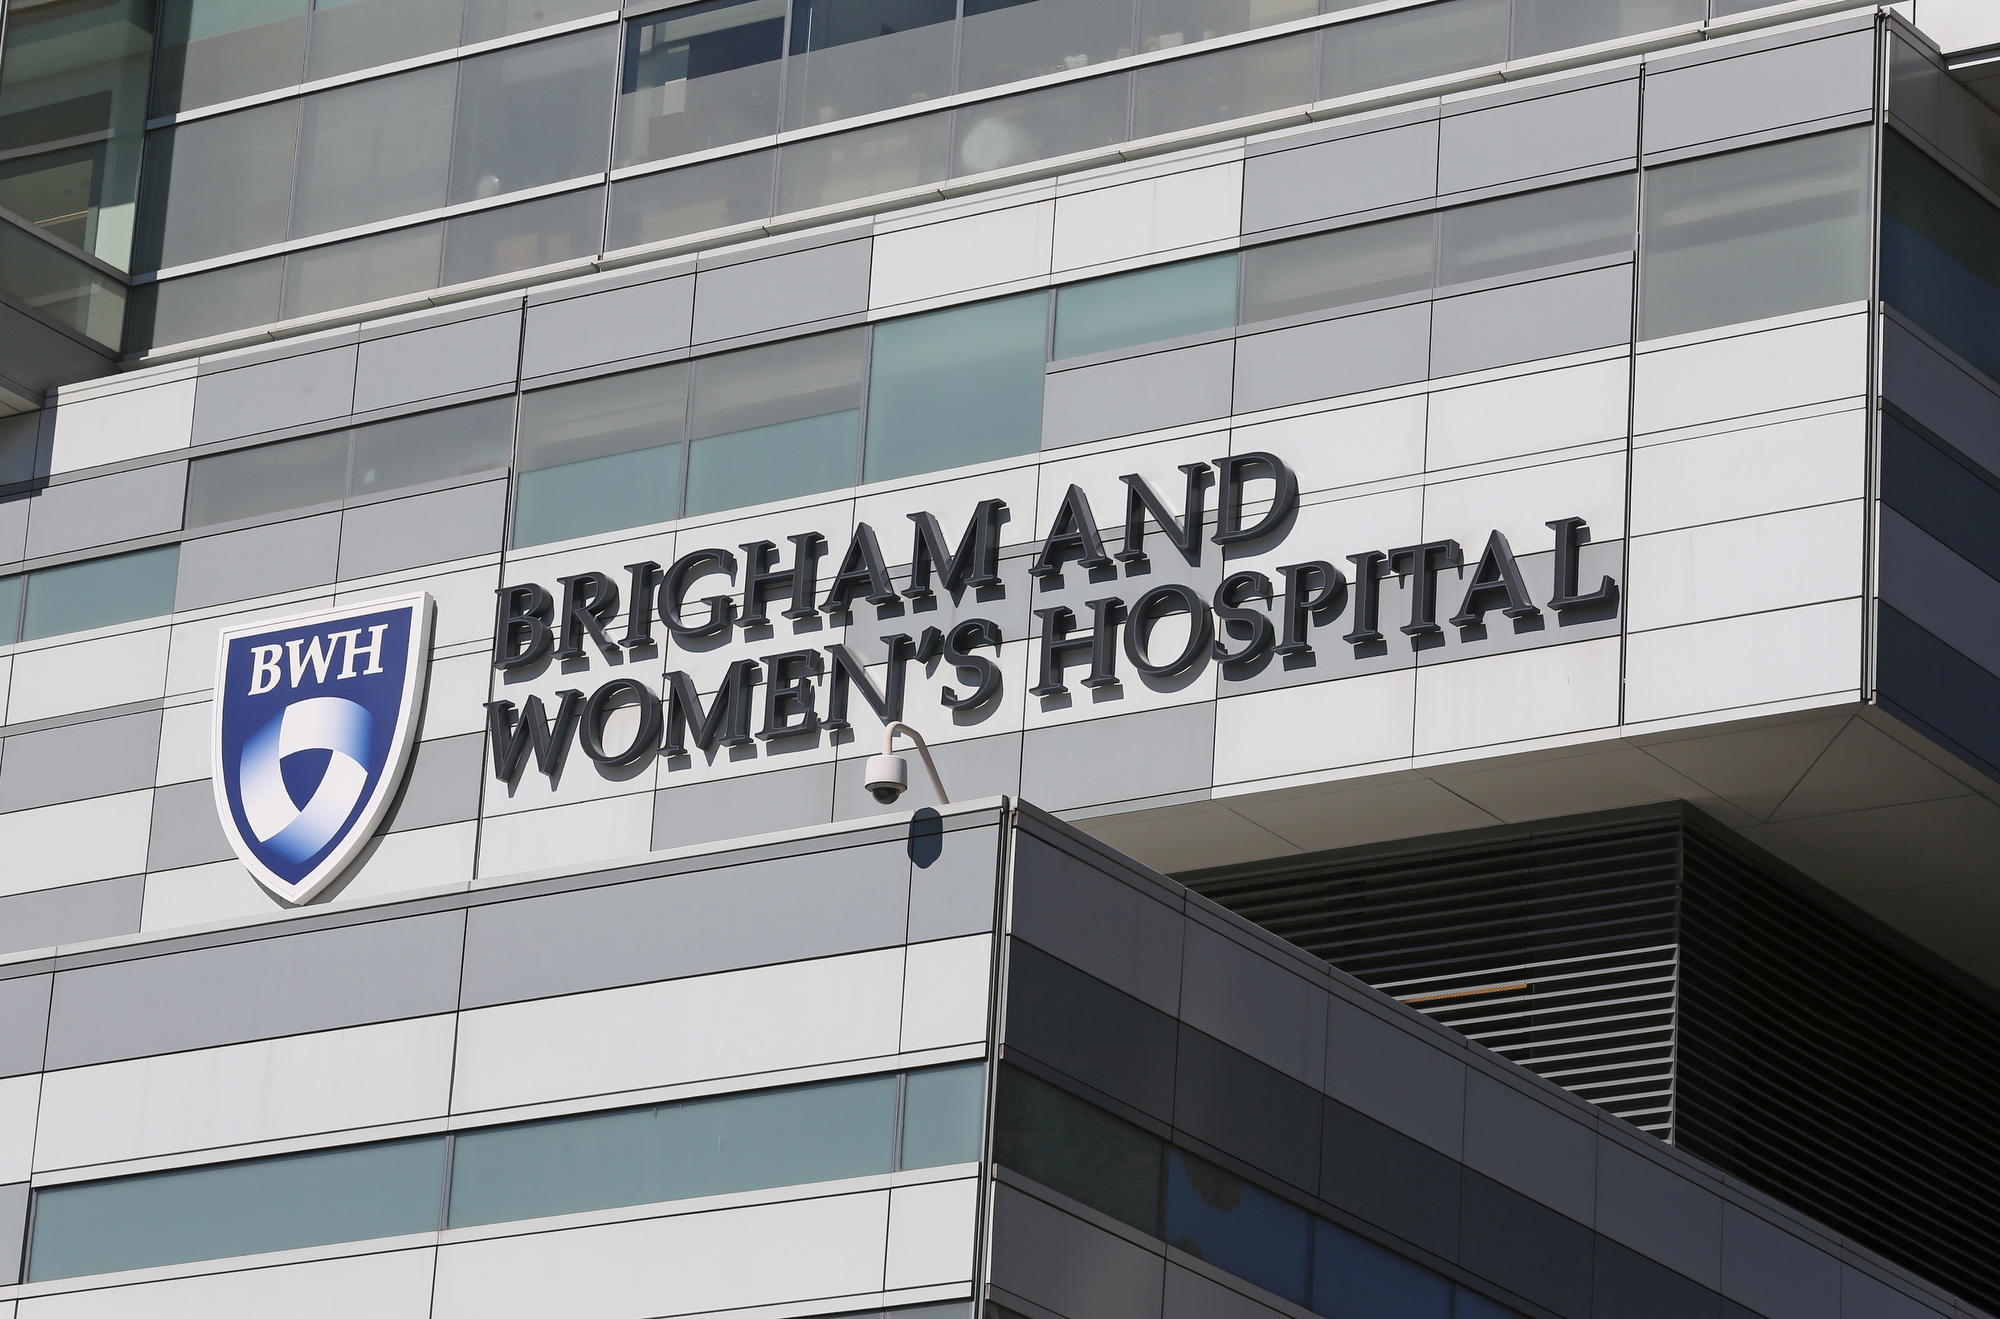 Brigham and Women's Hospital (BWH), Harvard University